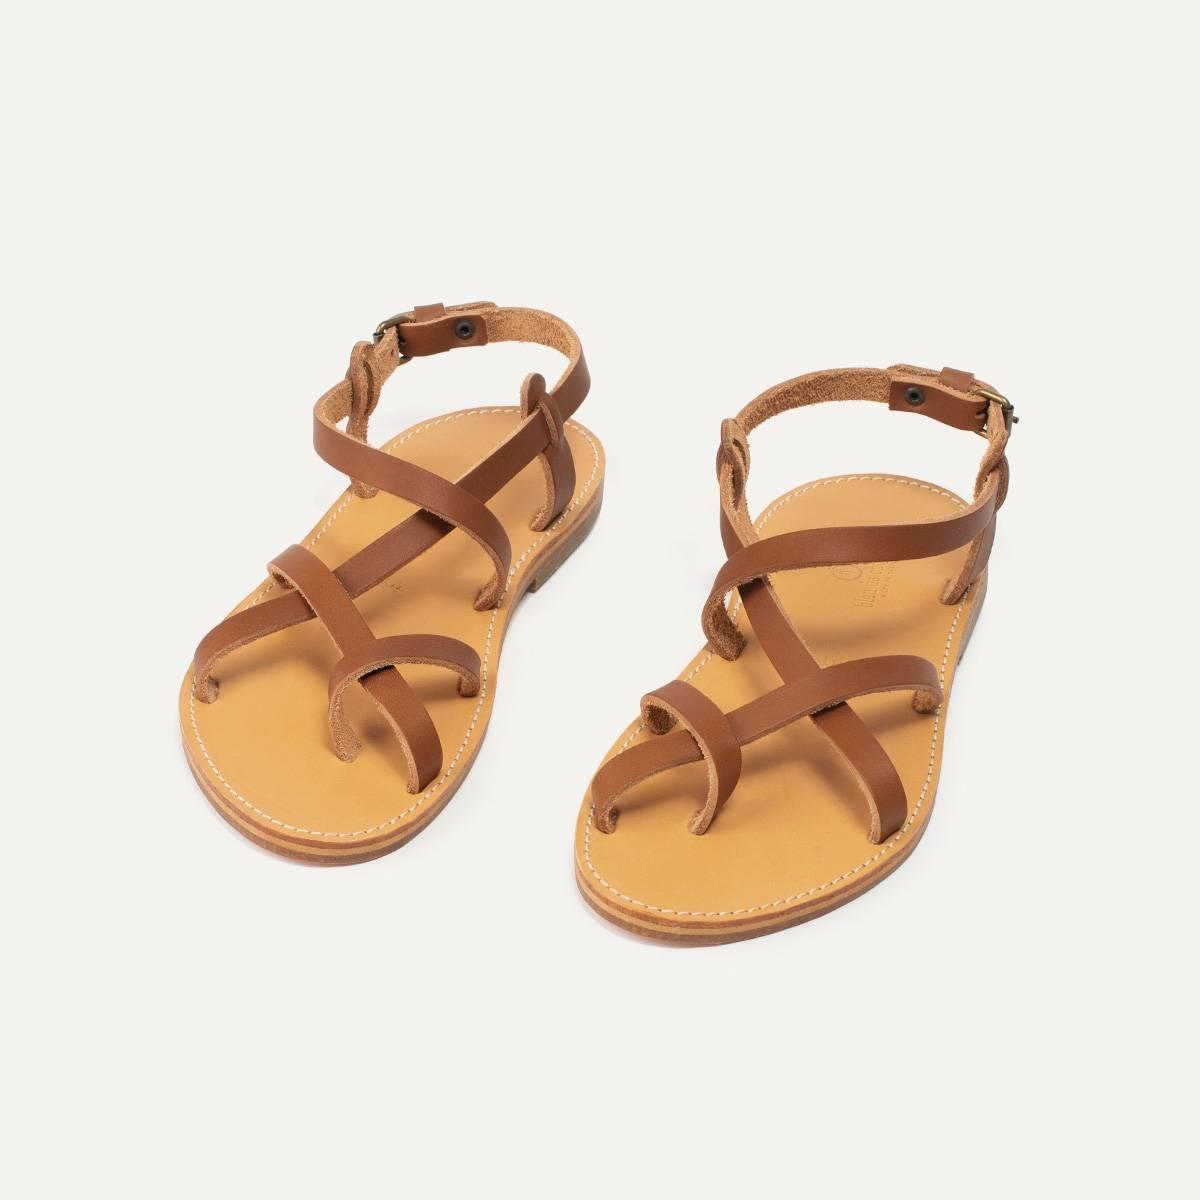 Nara leather sandals - Pain Brûlé (image n°5)